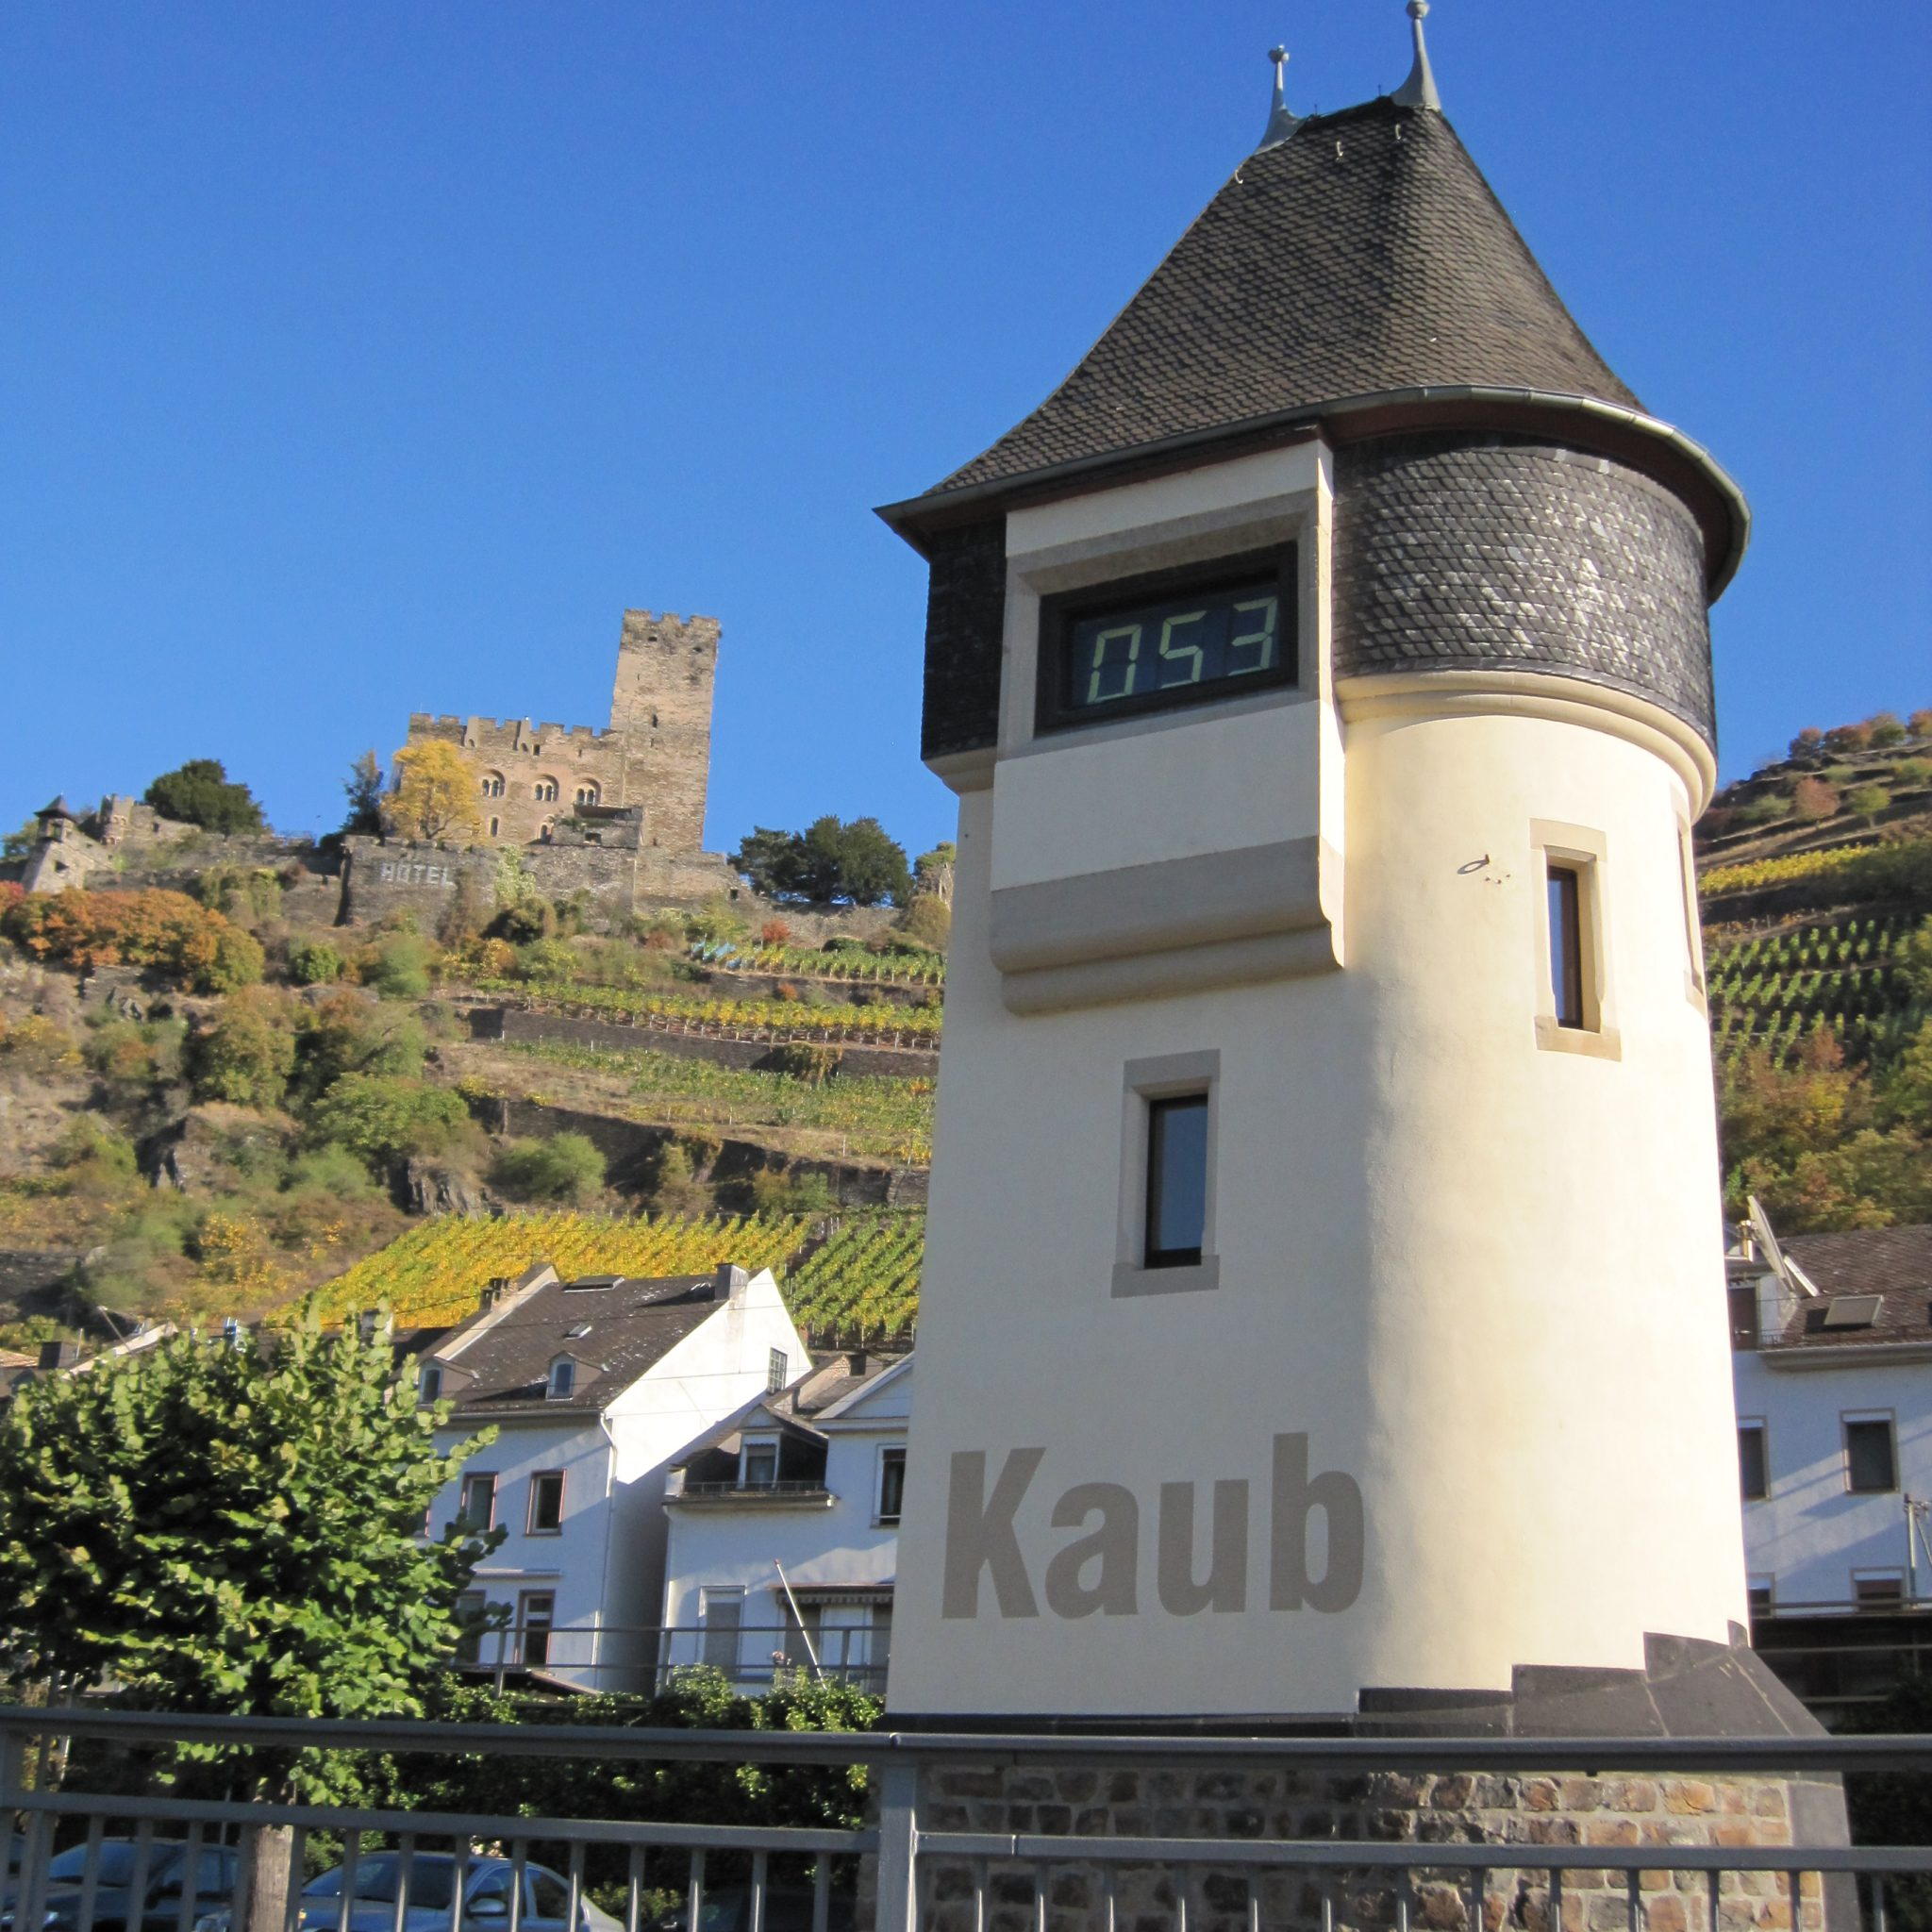 Ter illustratie: de pegel bij Kaub. (Foto Wikimedia)